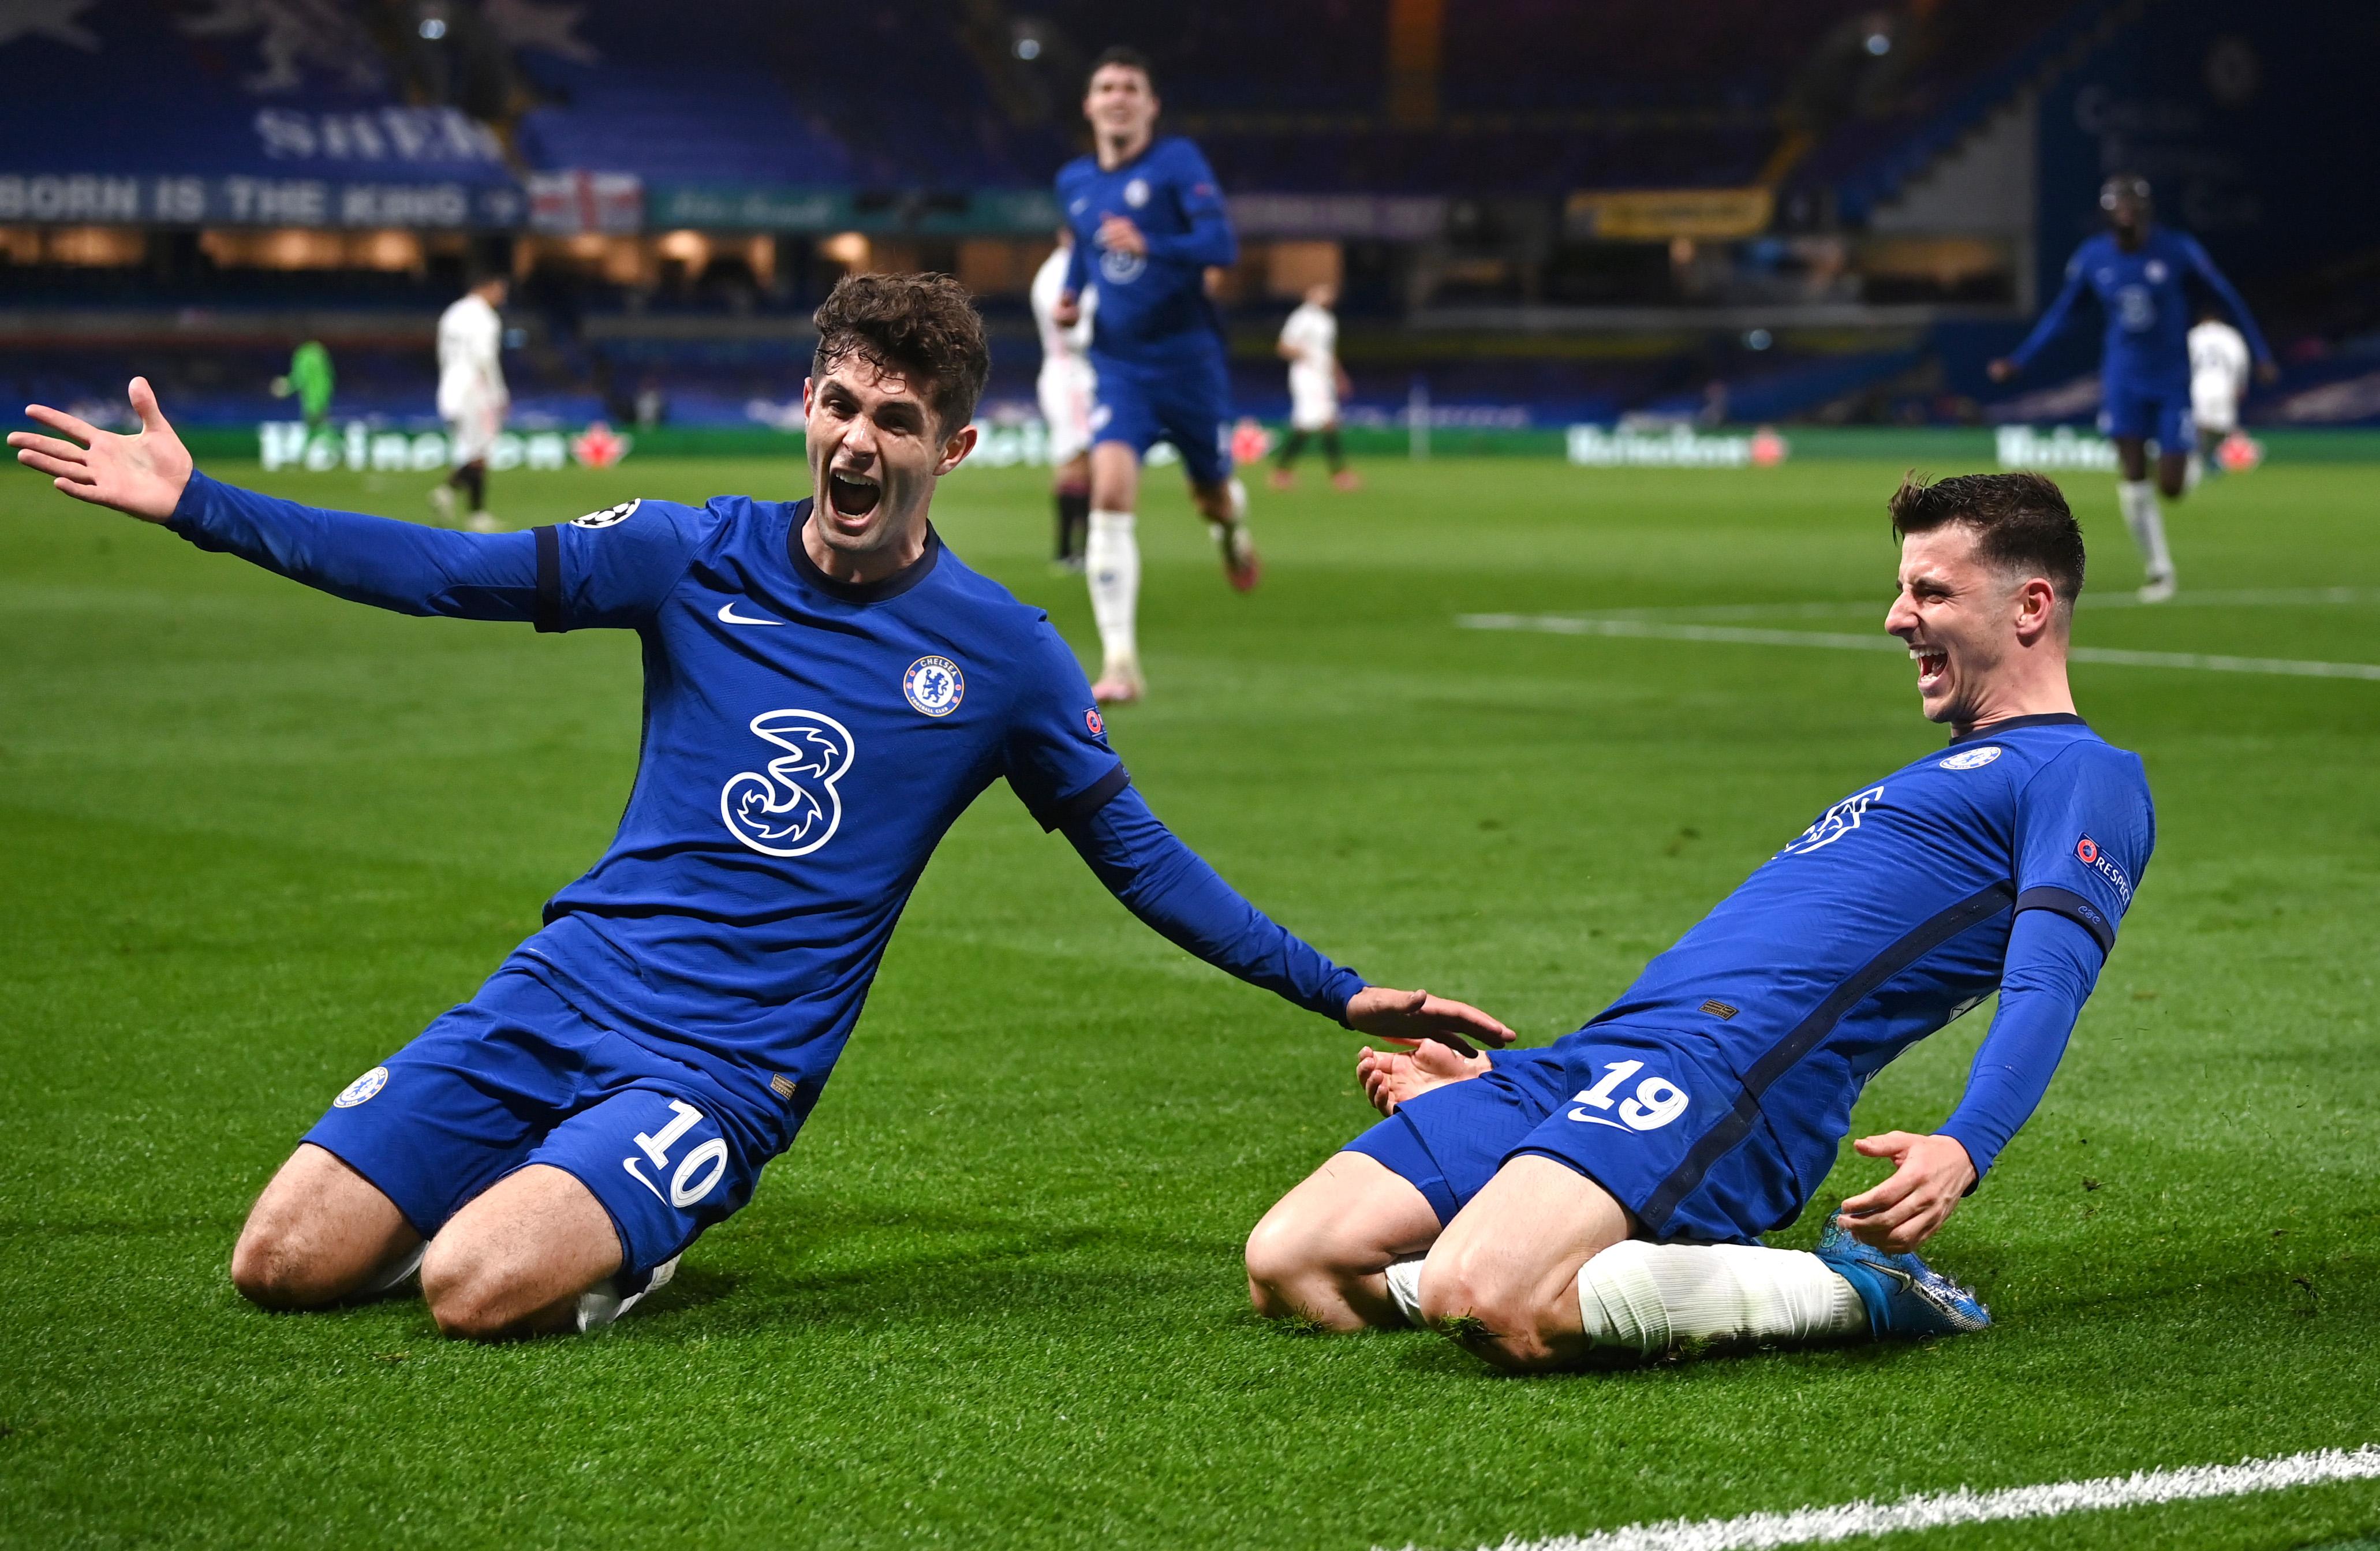 Mason Mount celebrates with Christian Pulisic - Chelsea - UEFA Champions League